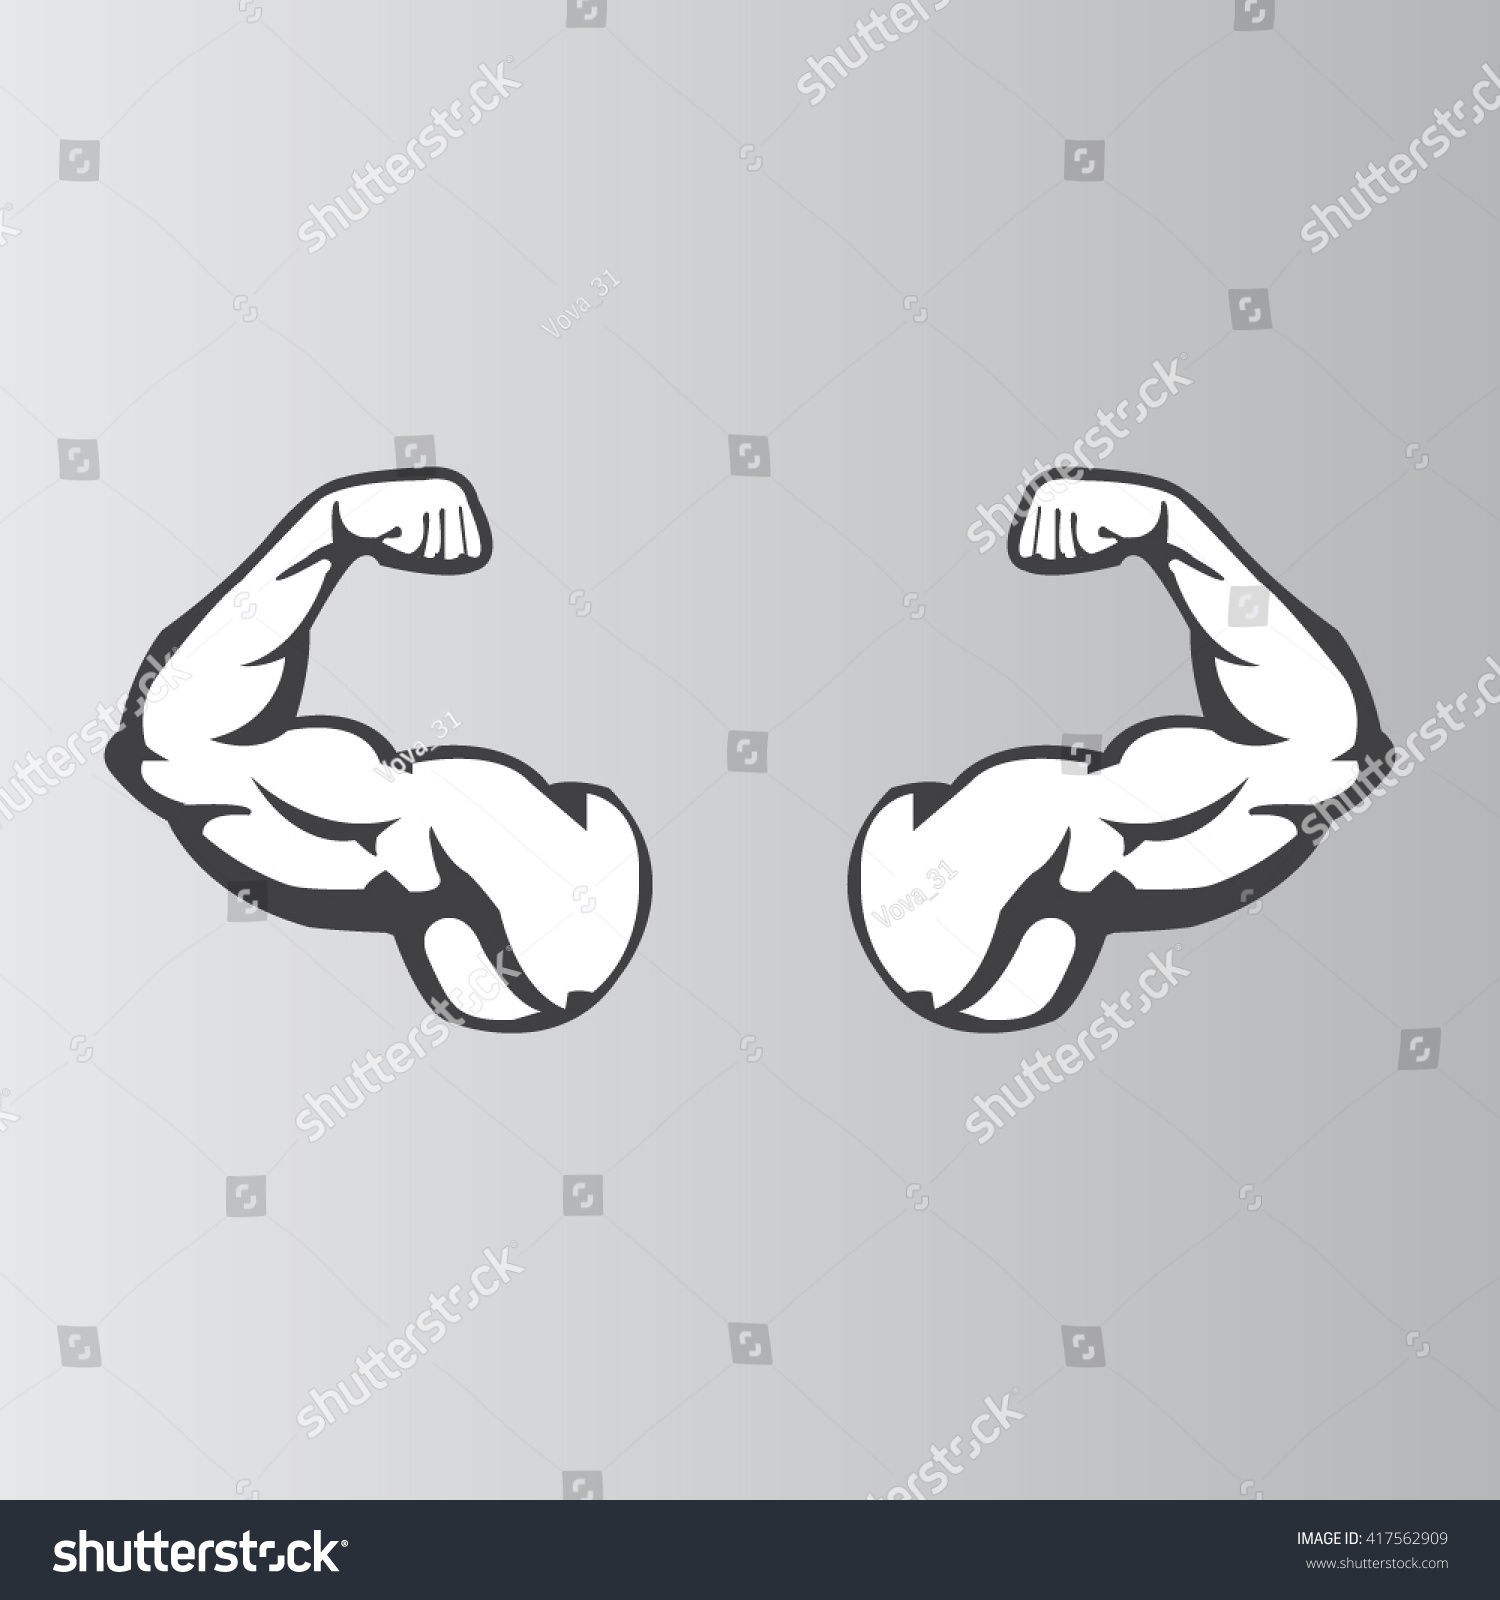 Arms clipart flexed arm. Free flex icon download